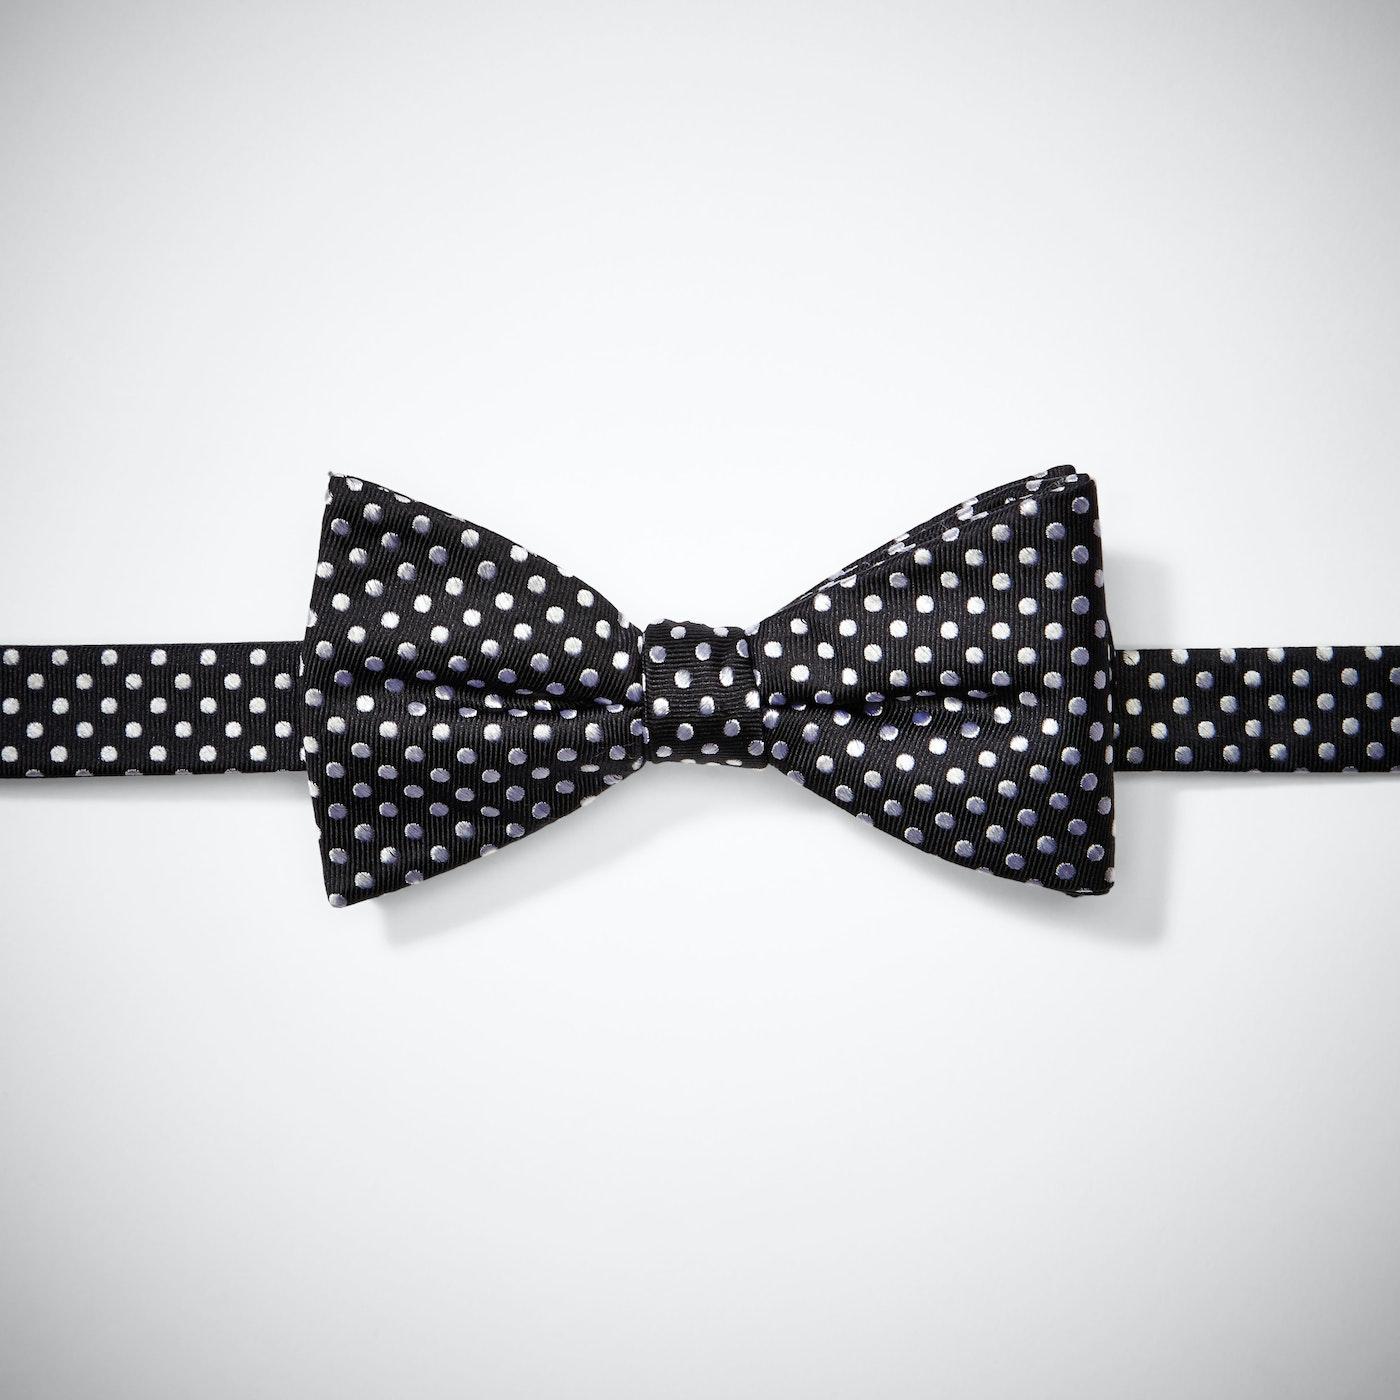 Black Polka Dot Pre-Tied Bow Tie